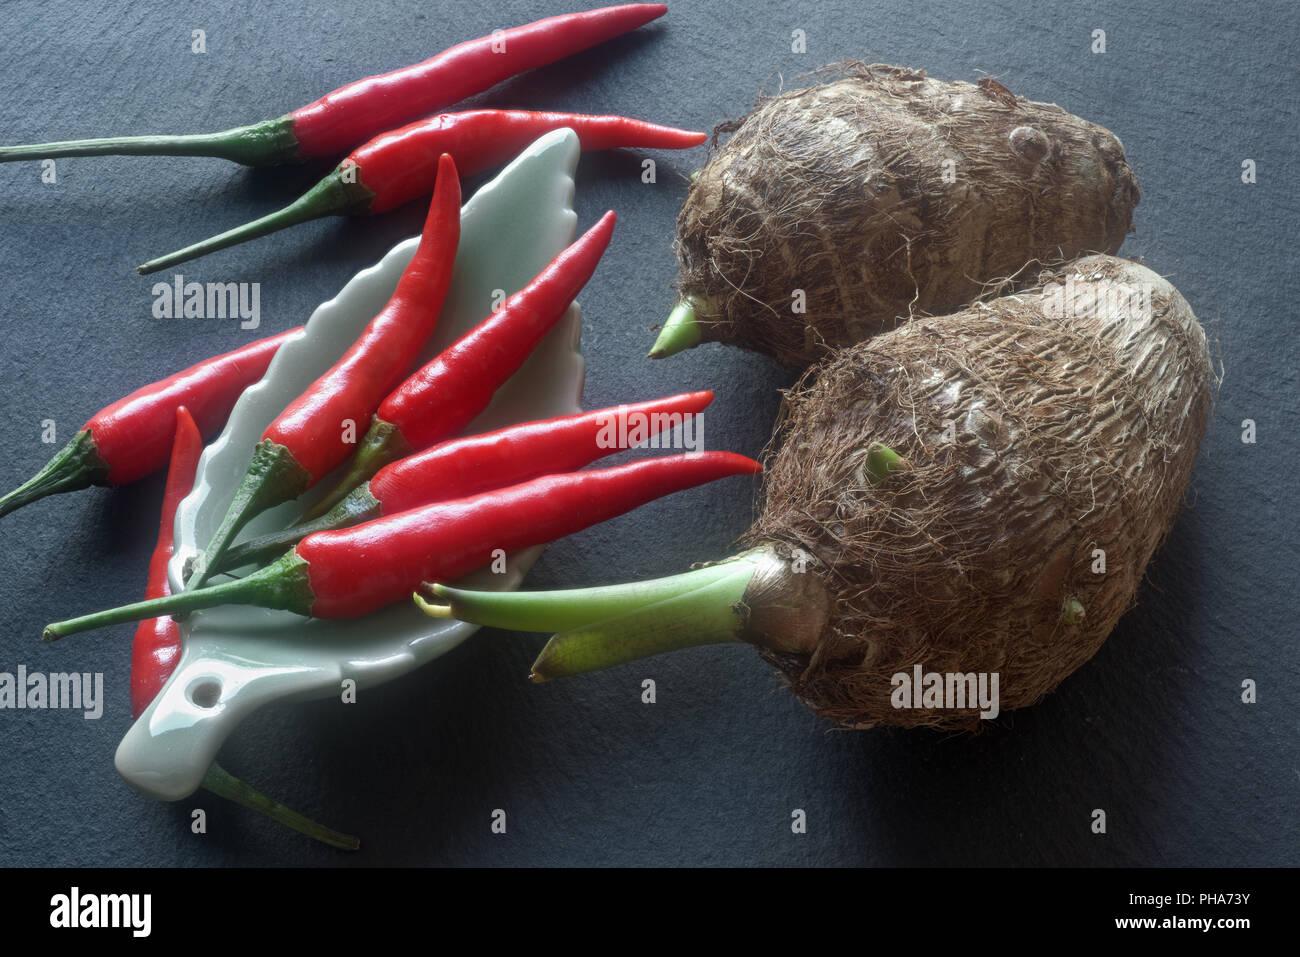 Taro rhizomes and chilis - Stock Image